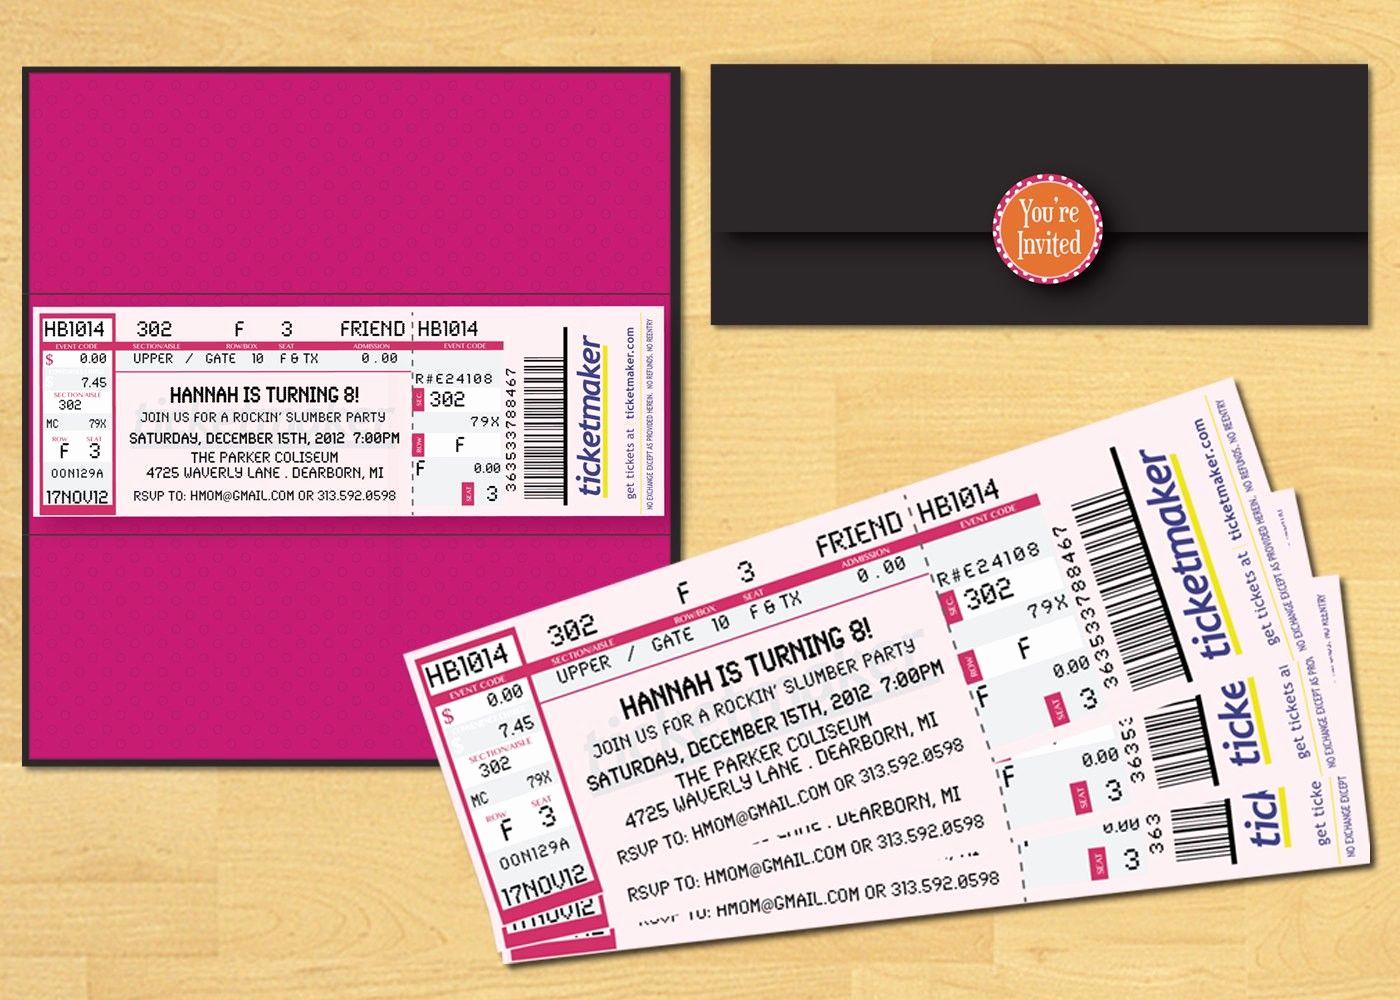 Movie Ticket Invitation Template Luxury Movie Ticket Party Invitations Printable